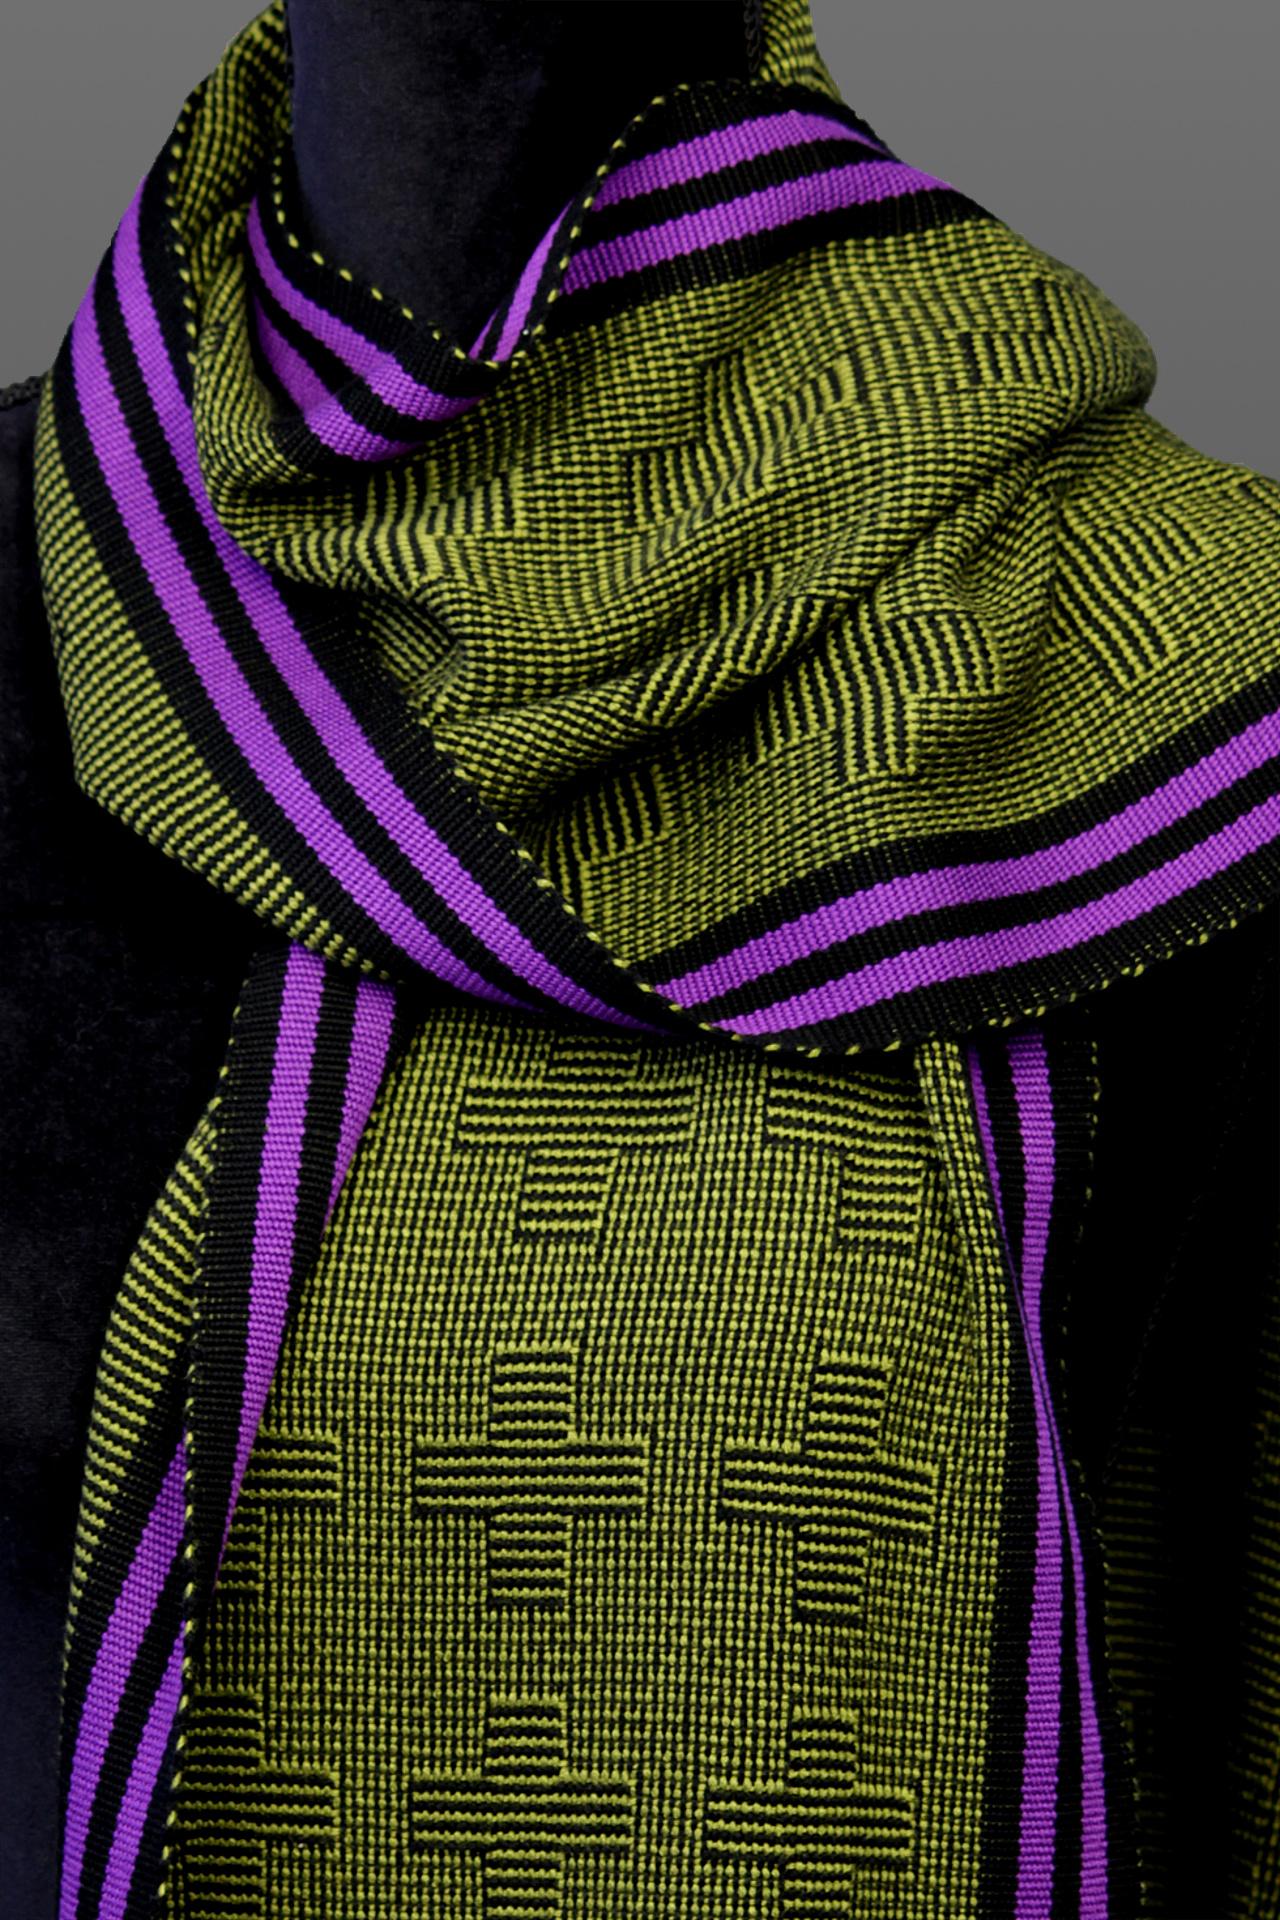 San Tasu Green Tea Pansy_49 CU.jpg